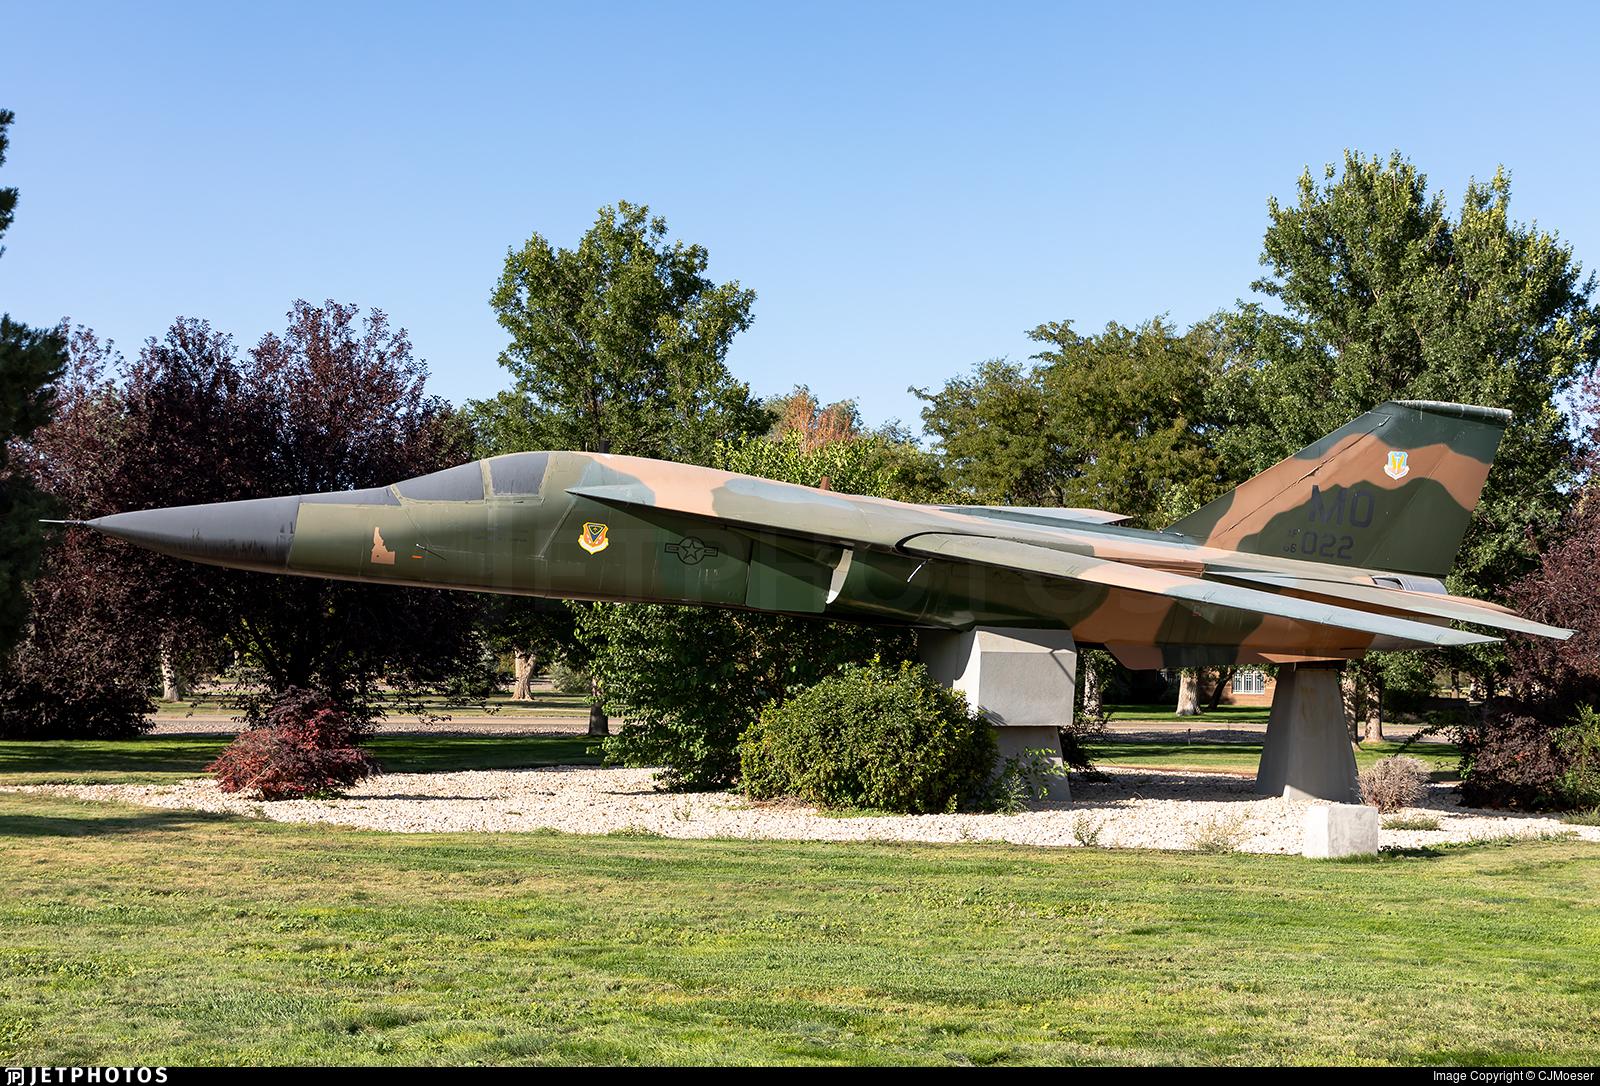 63-9776 - General Dynamics F-111A Aardvark - United States - US Air Force (USAF)